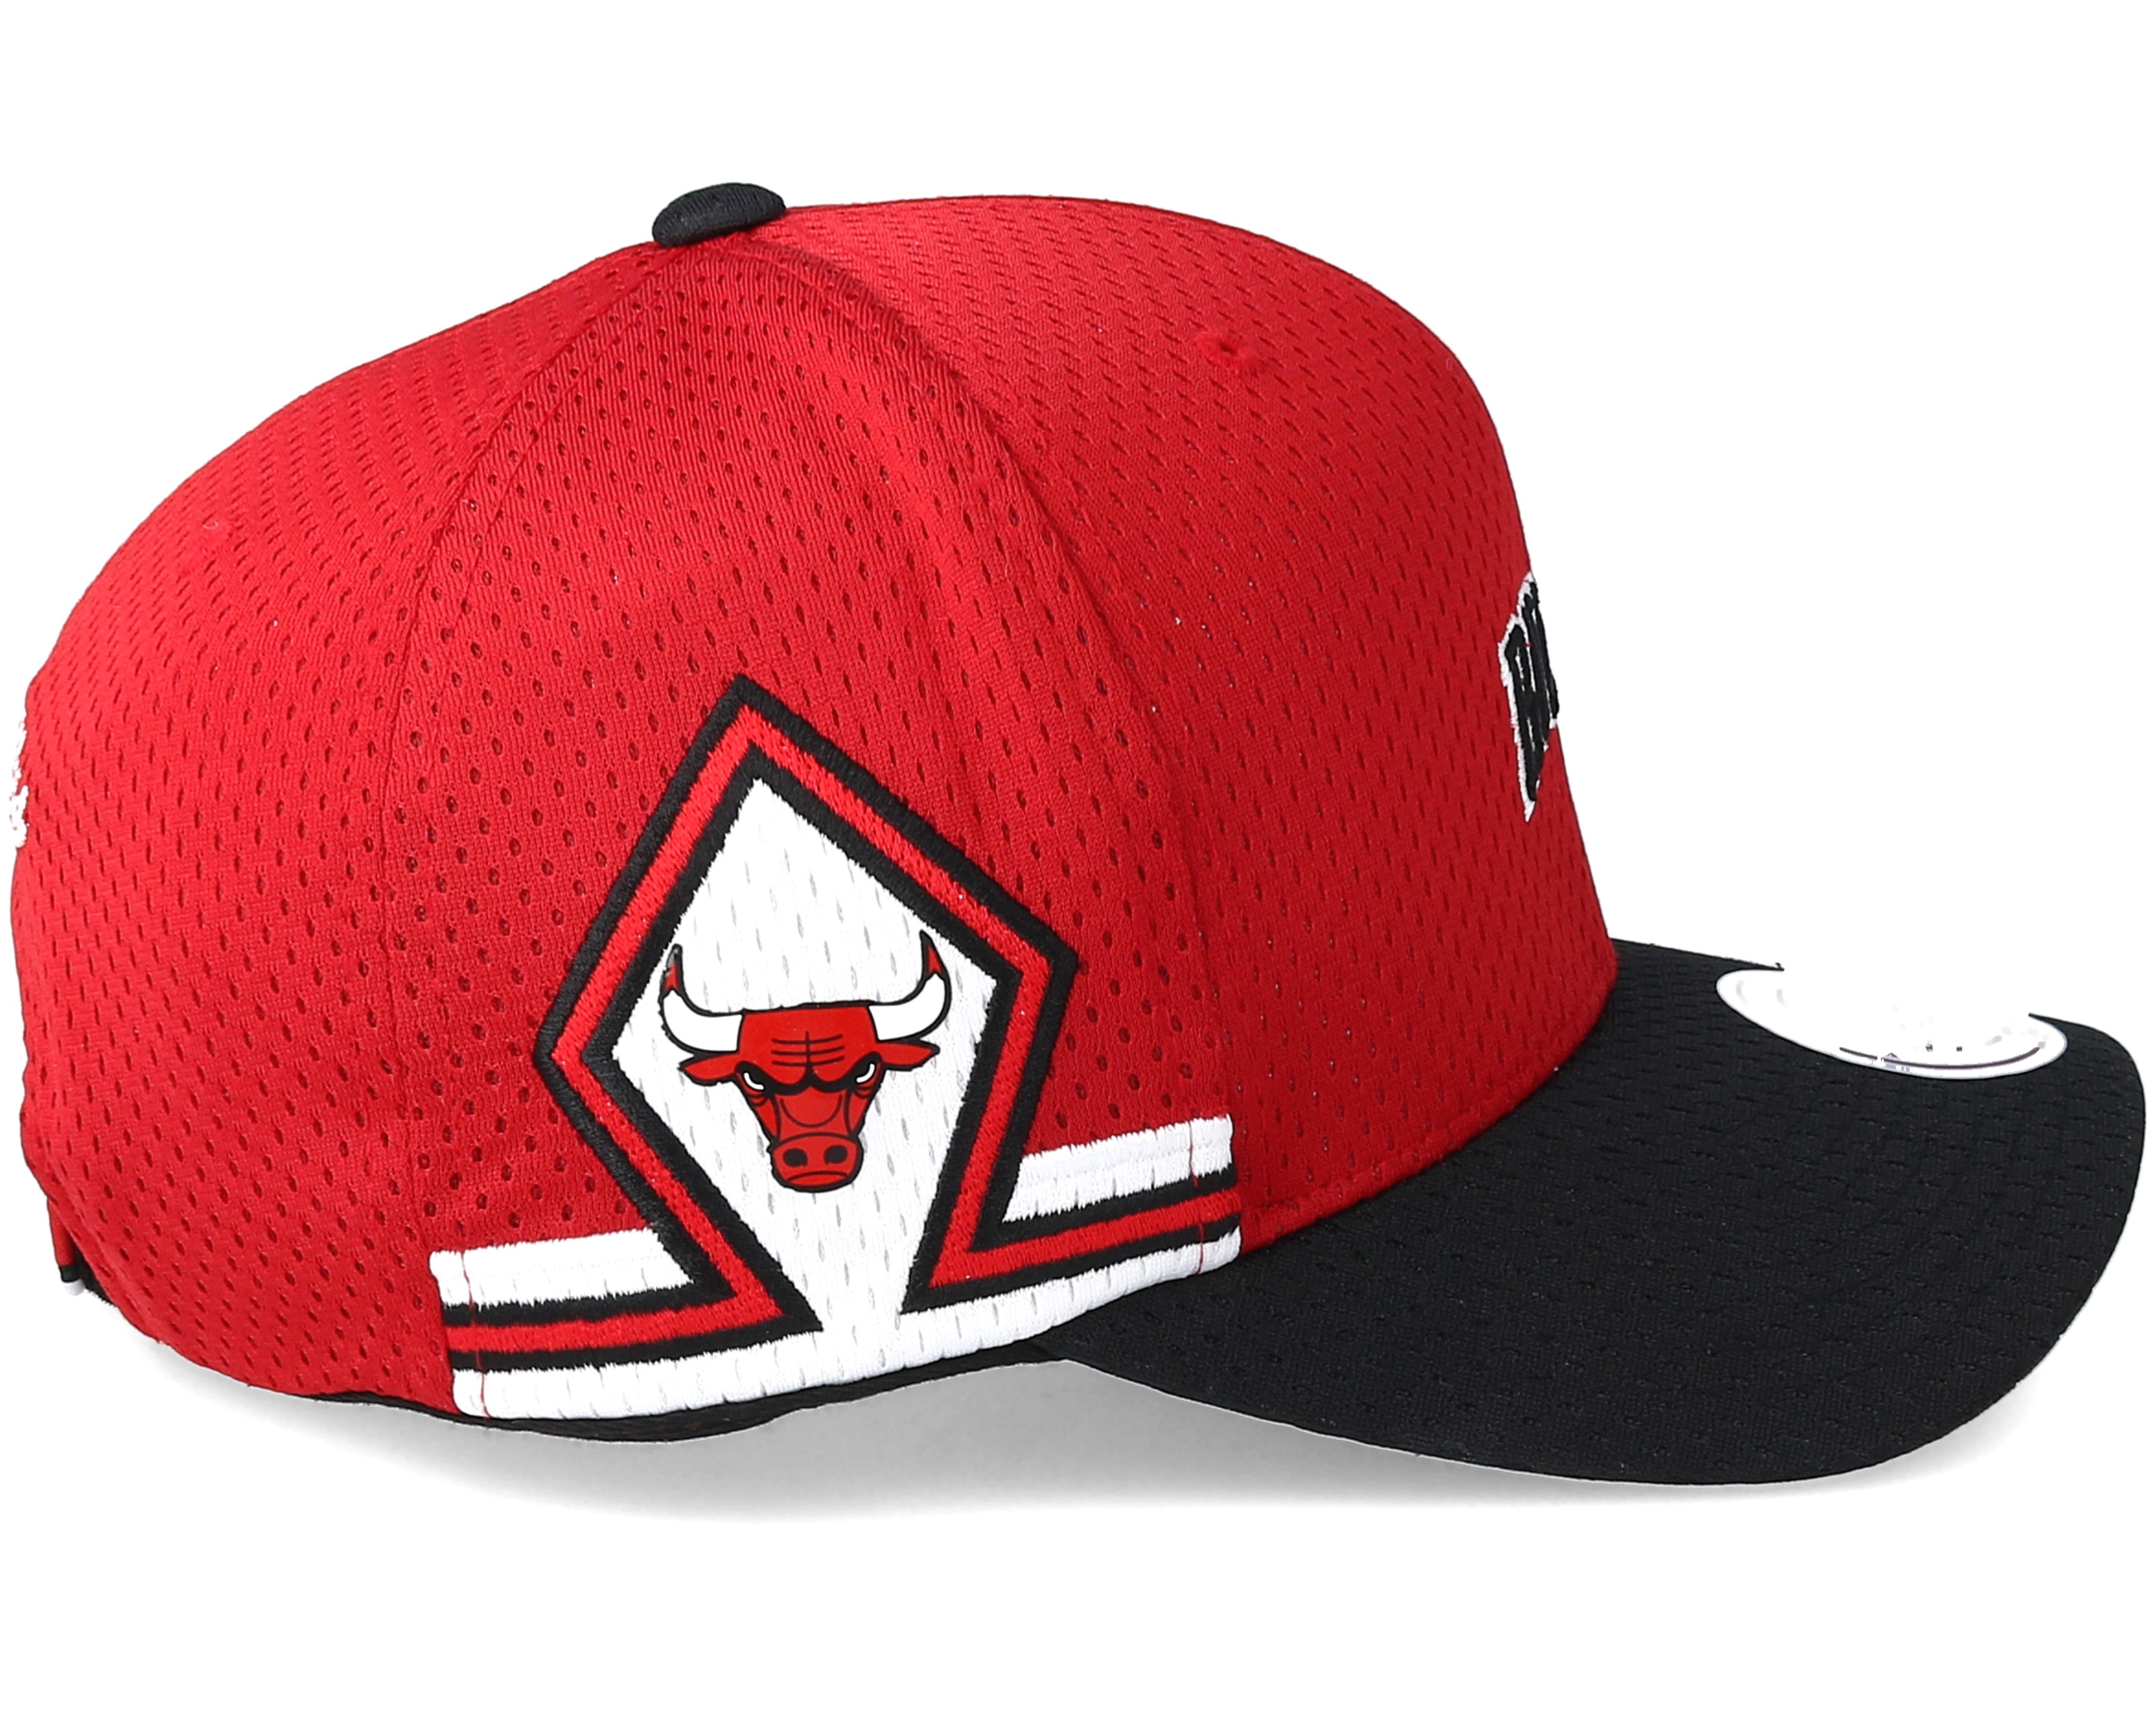 chicago bulls jersey hook loop red adjustable mitchell. Black Bedroom Furniture Sets. Home Design Ideas